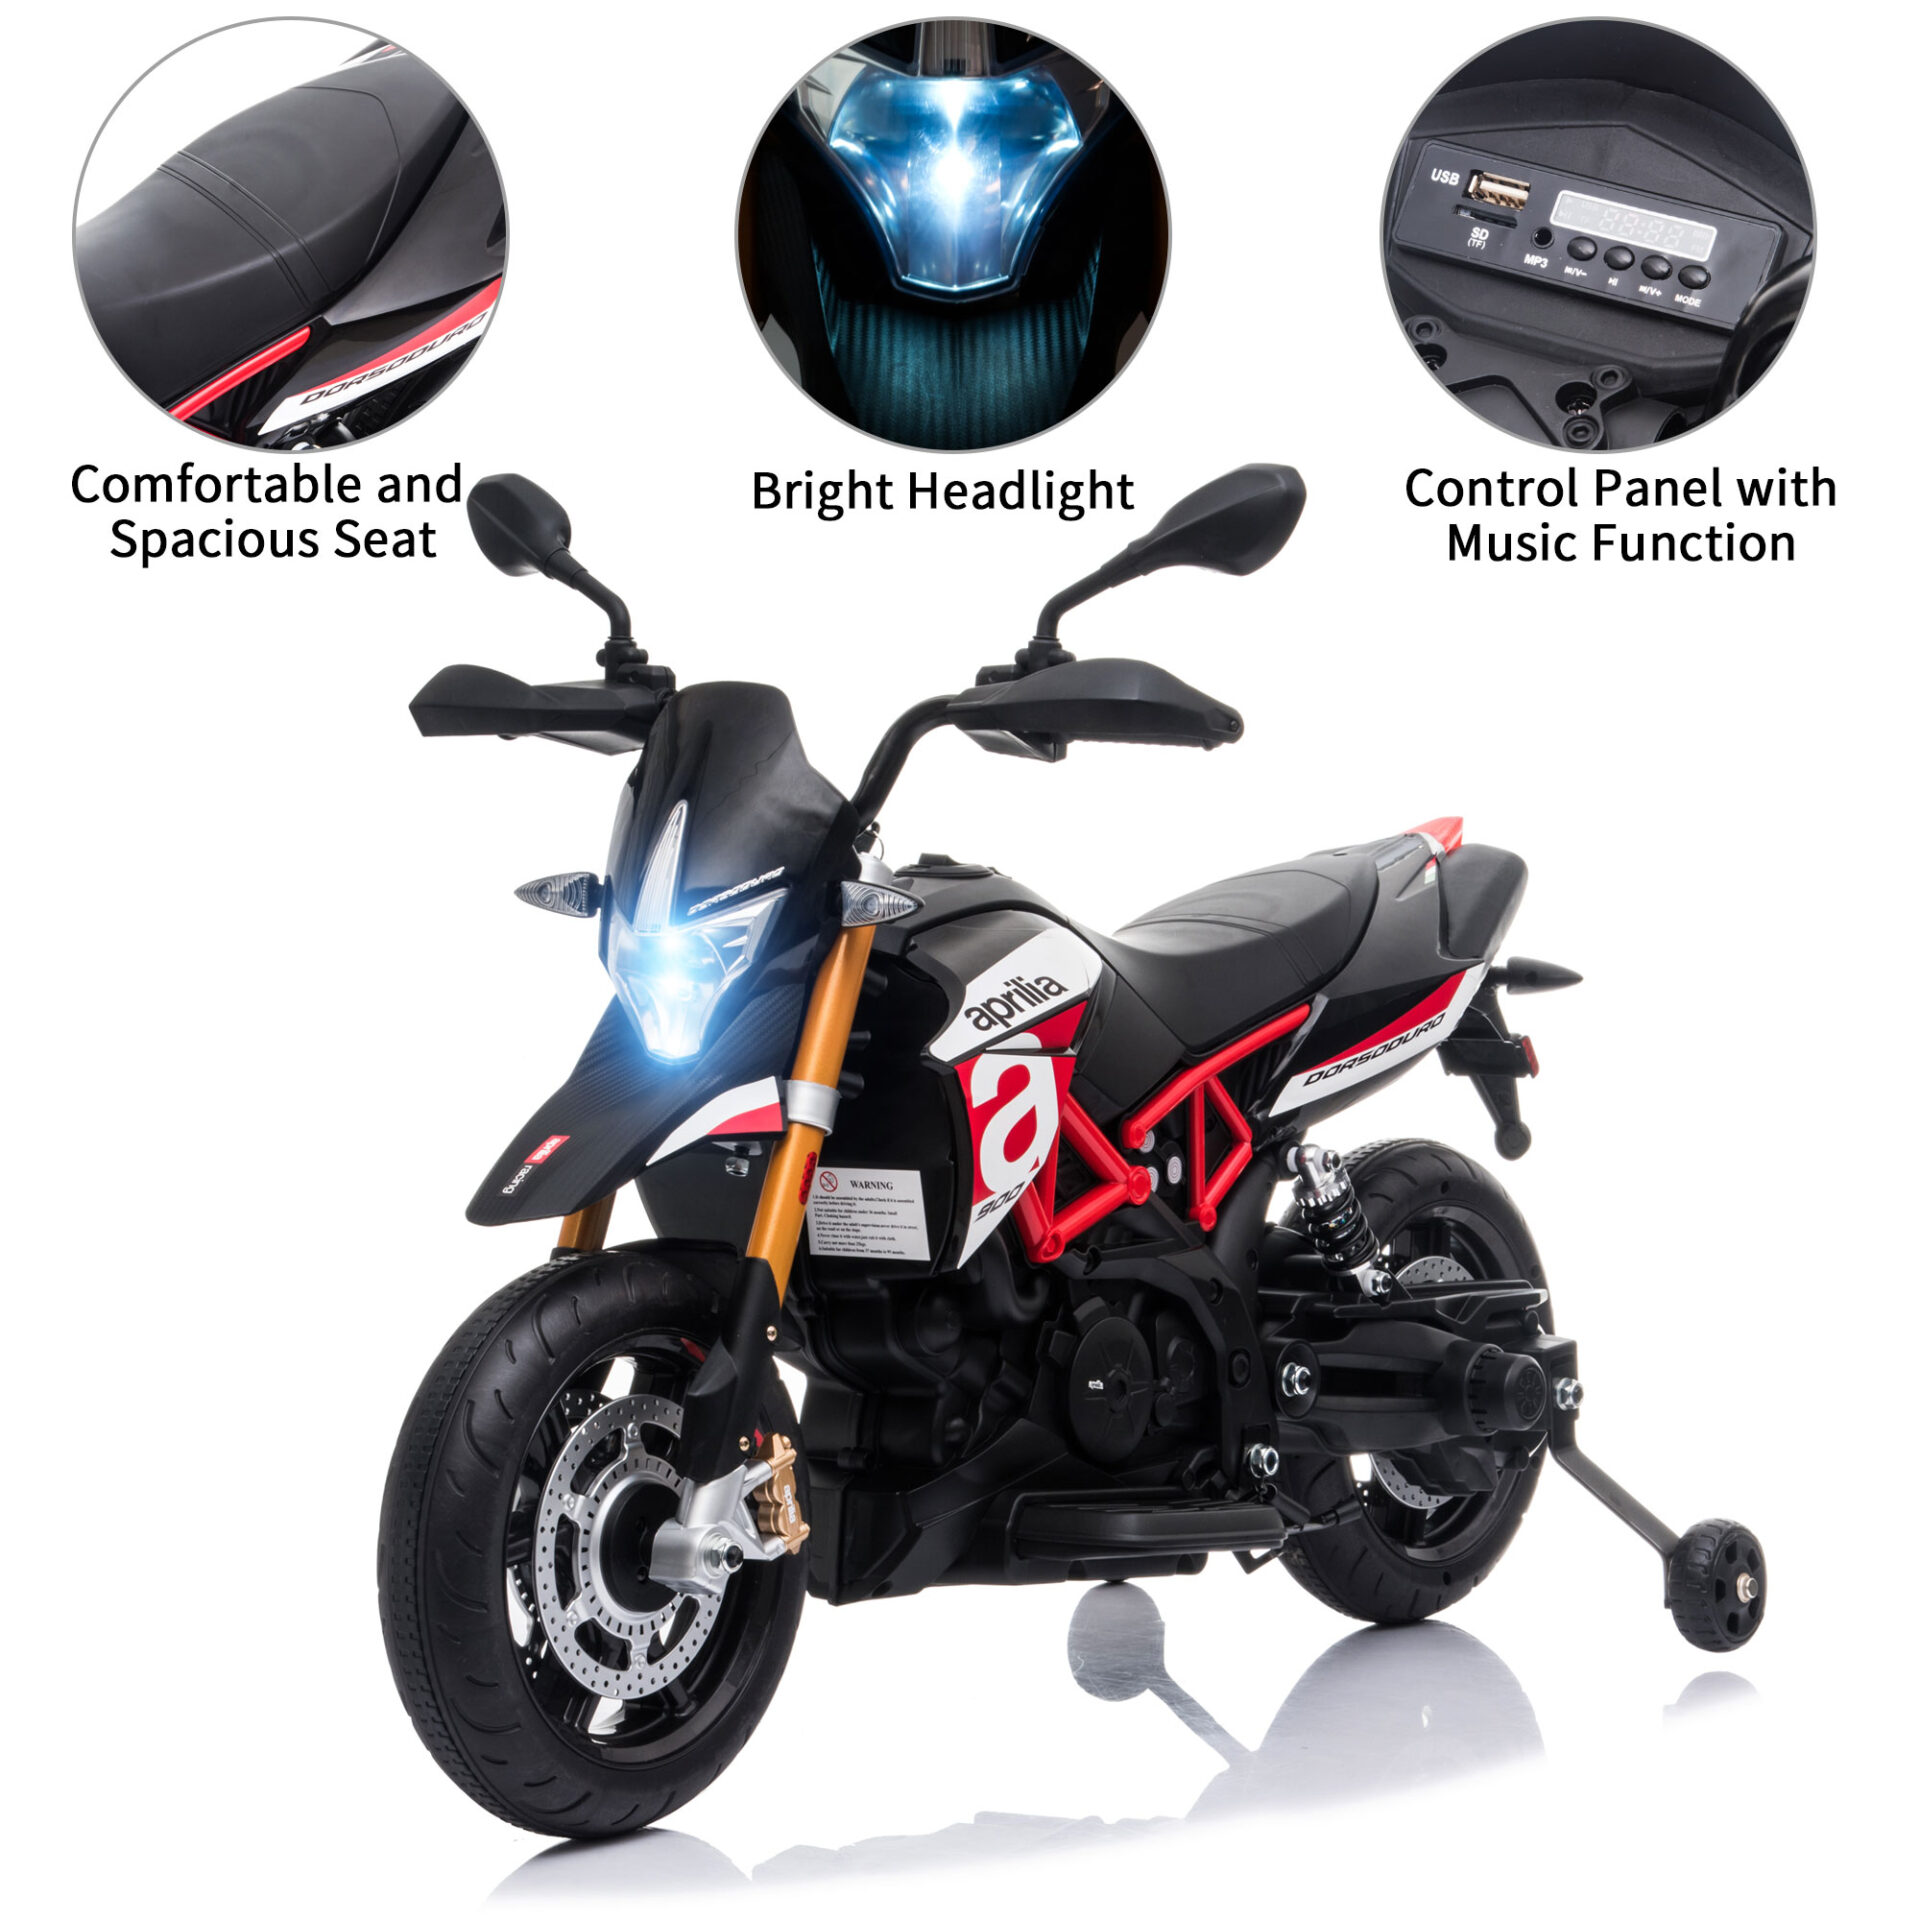 12V kids motorcycle bike W/ Training Wheels TH17A0661 zt1